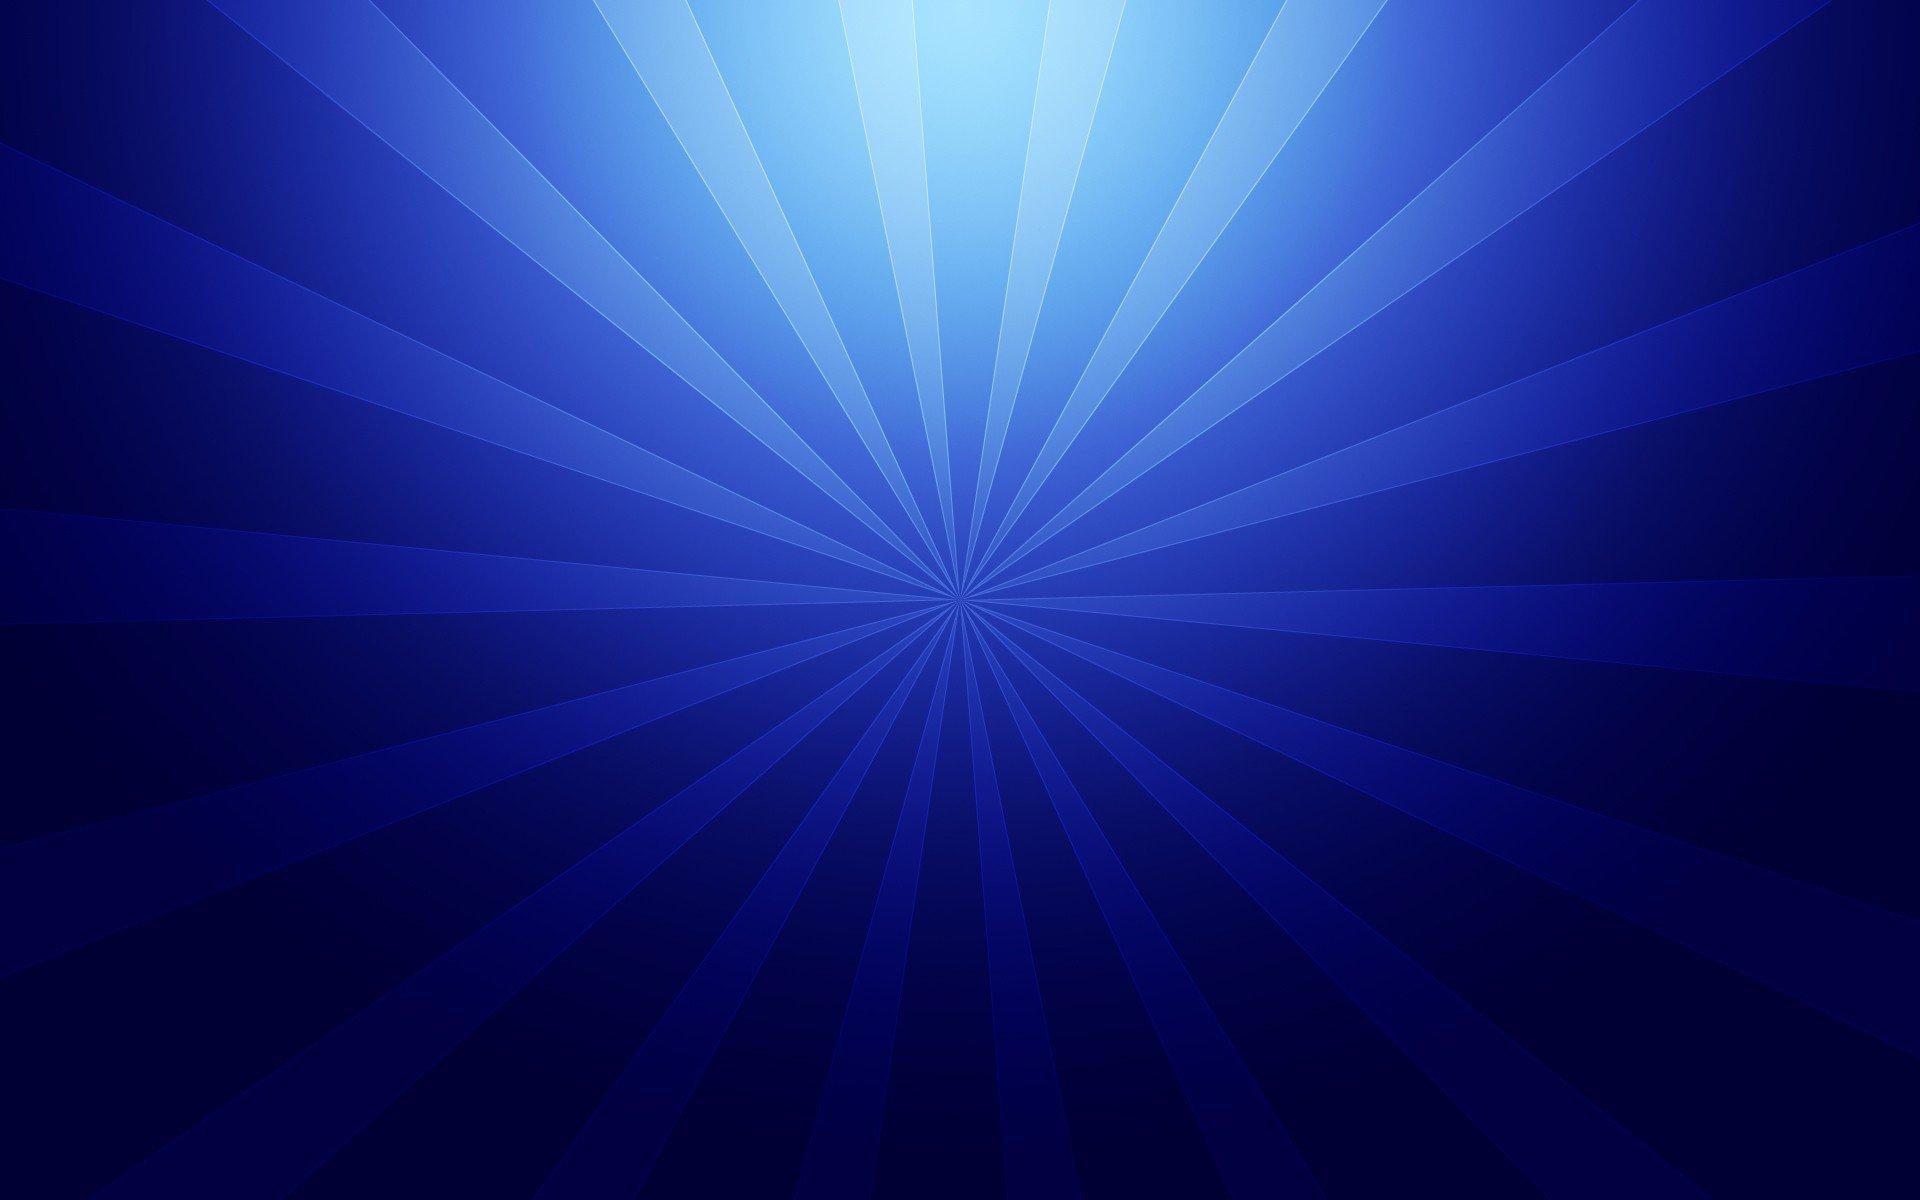 blue radial image